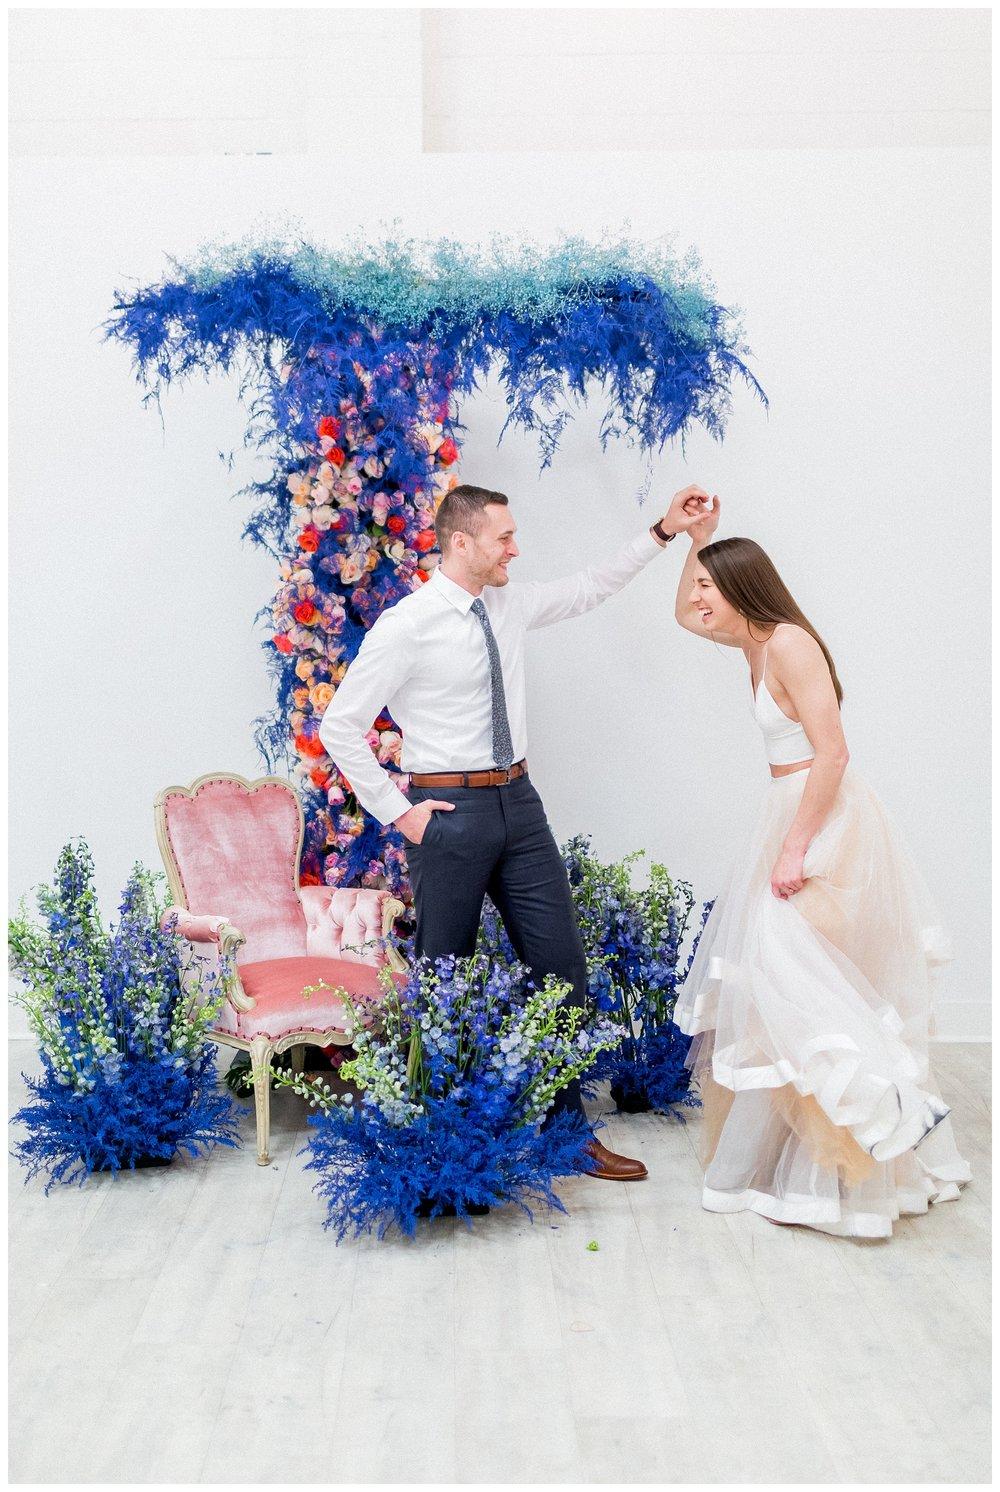 Prism Annapolis Engagement | Intrigue Floral Design Workshop | Maryland Engagement Photos_0019.jpg